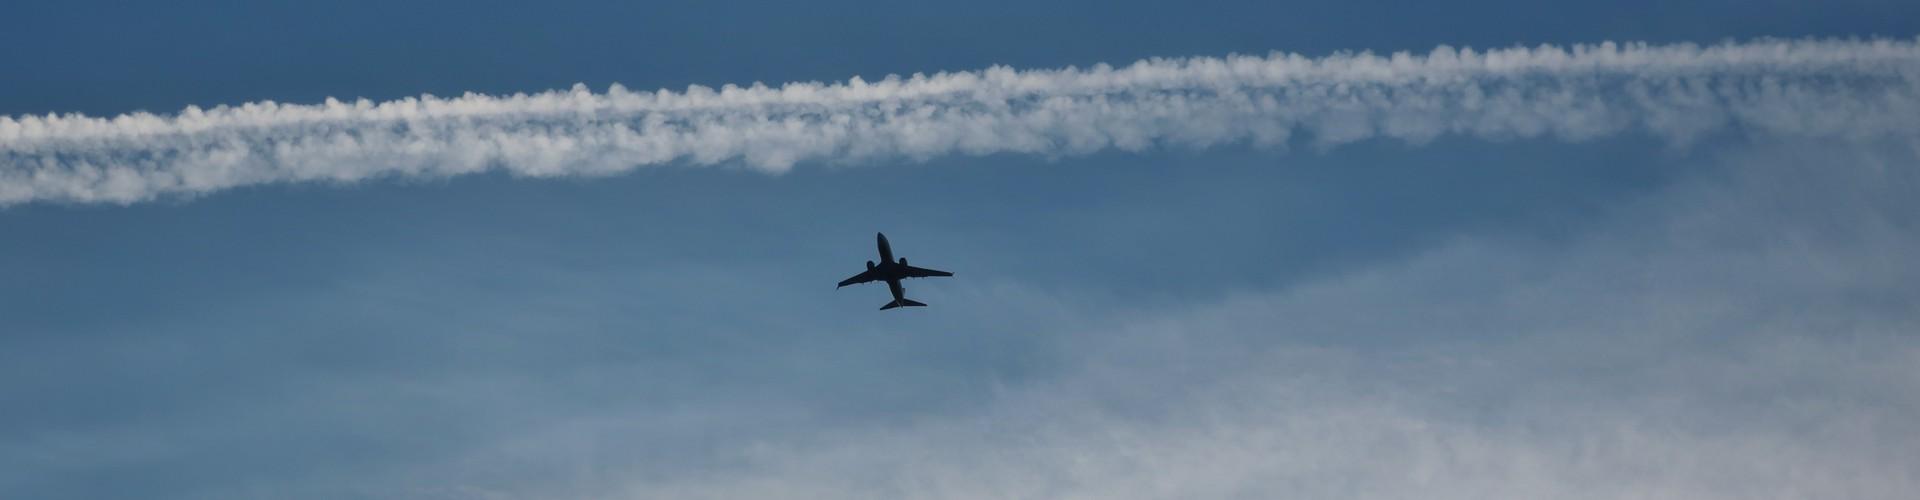 Airplane contrails (Credit: Plum Pine via Flickr)